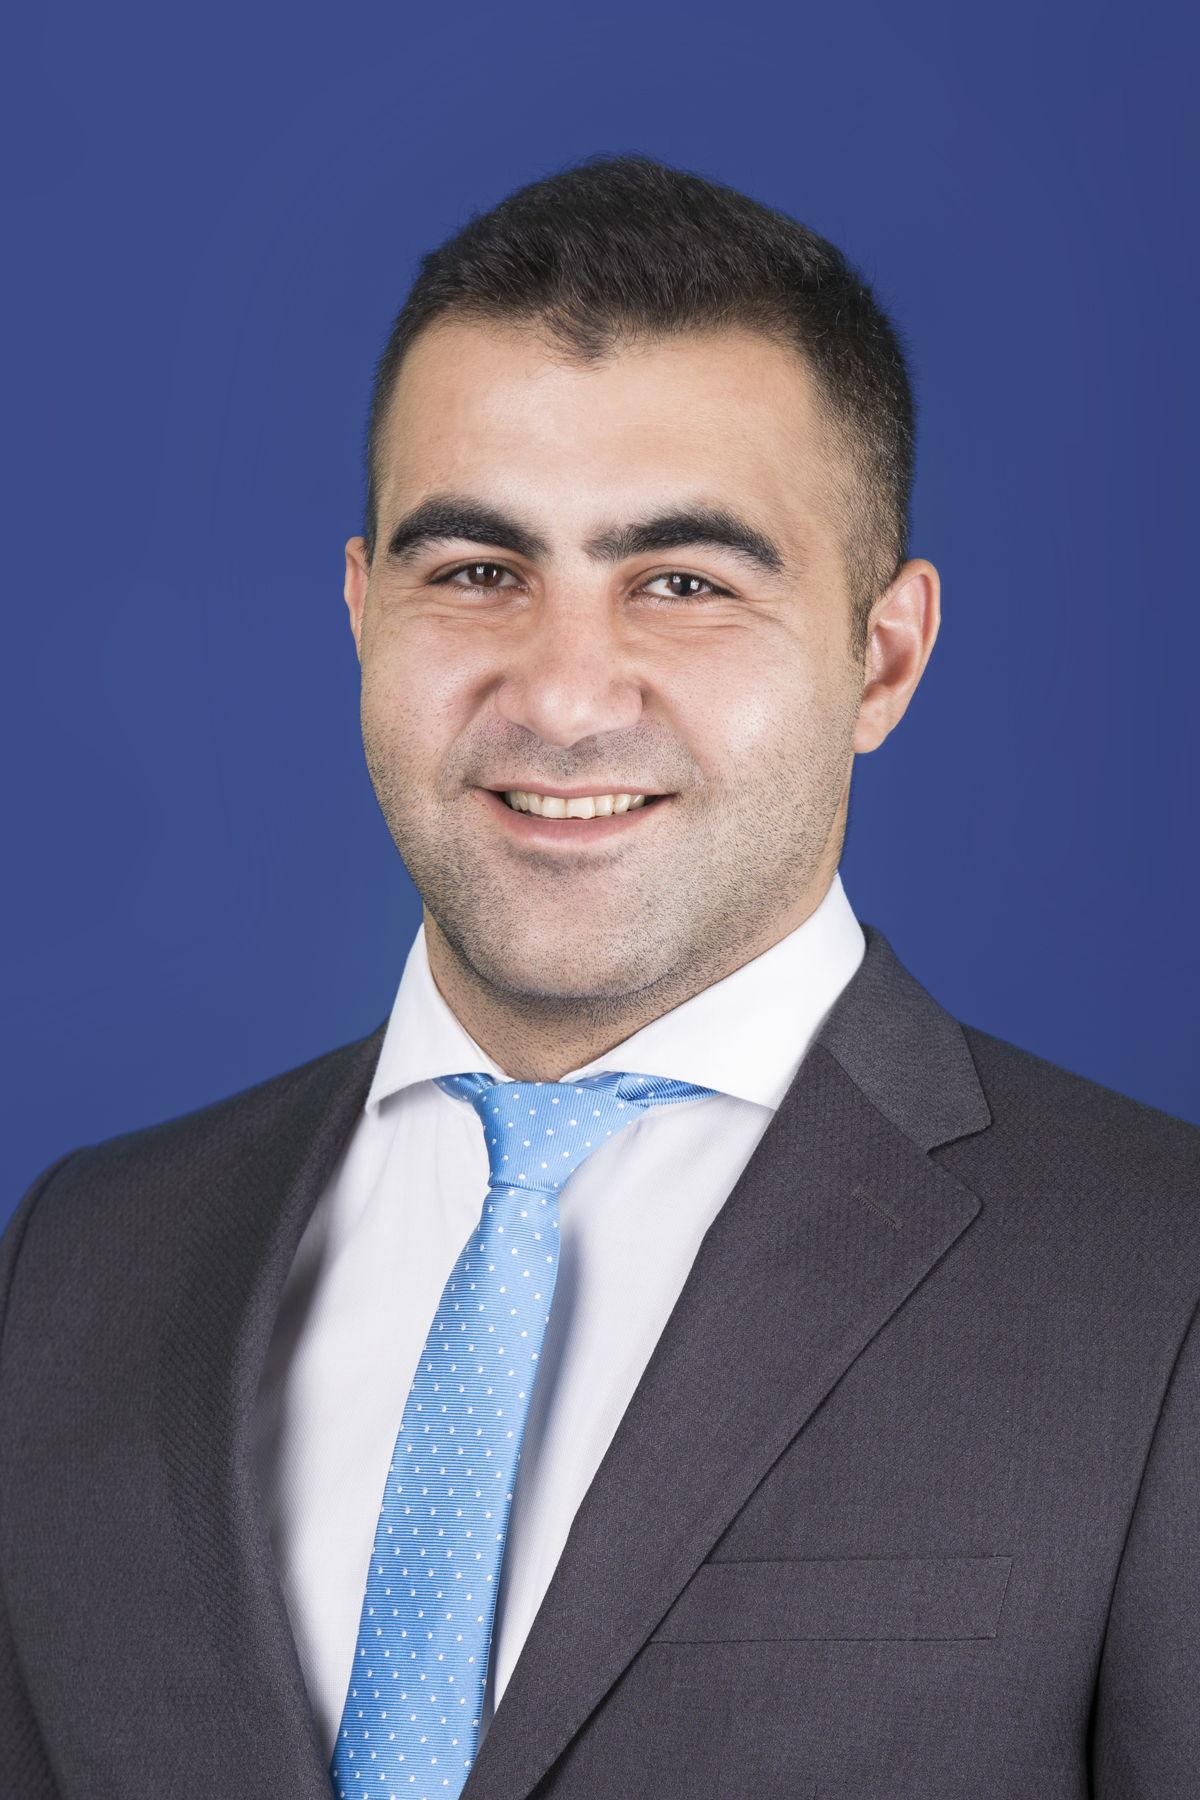 Youssef A. Wazni